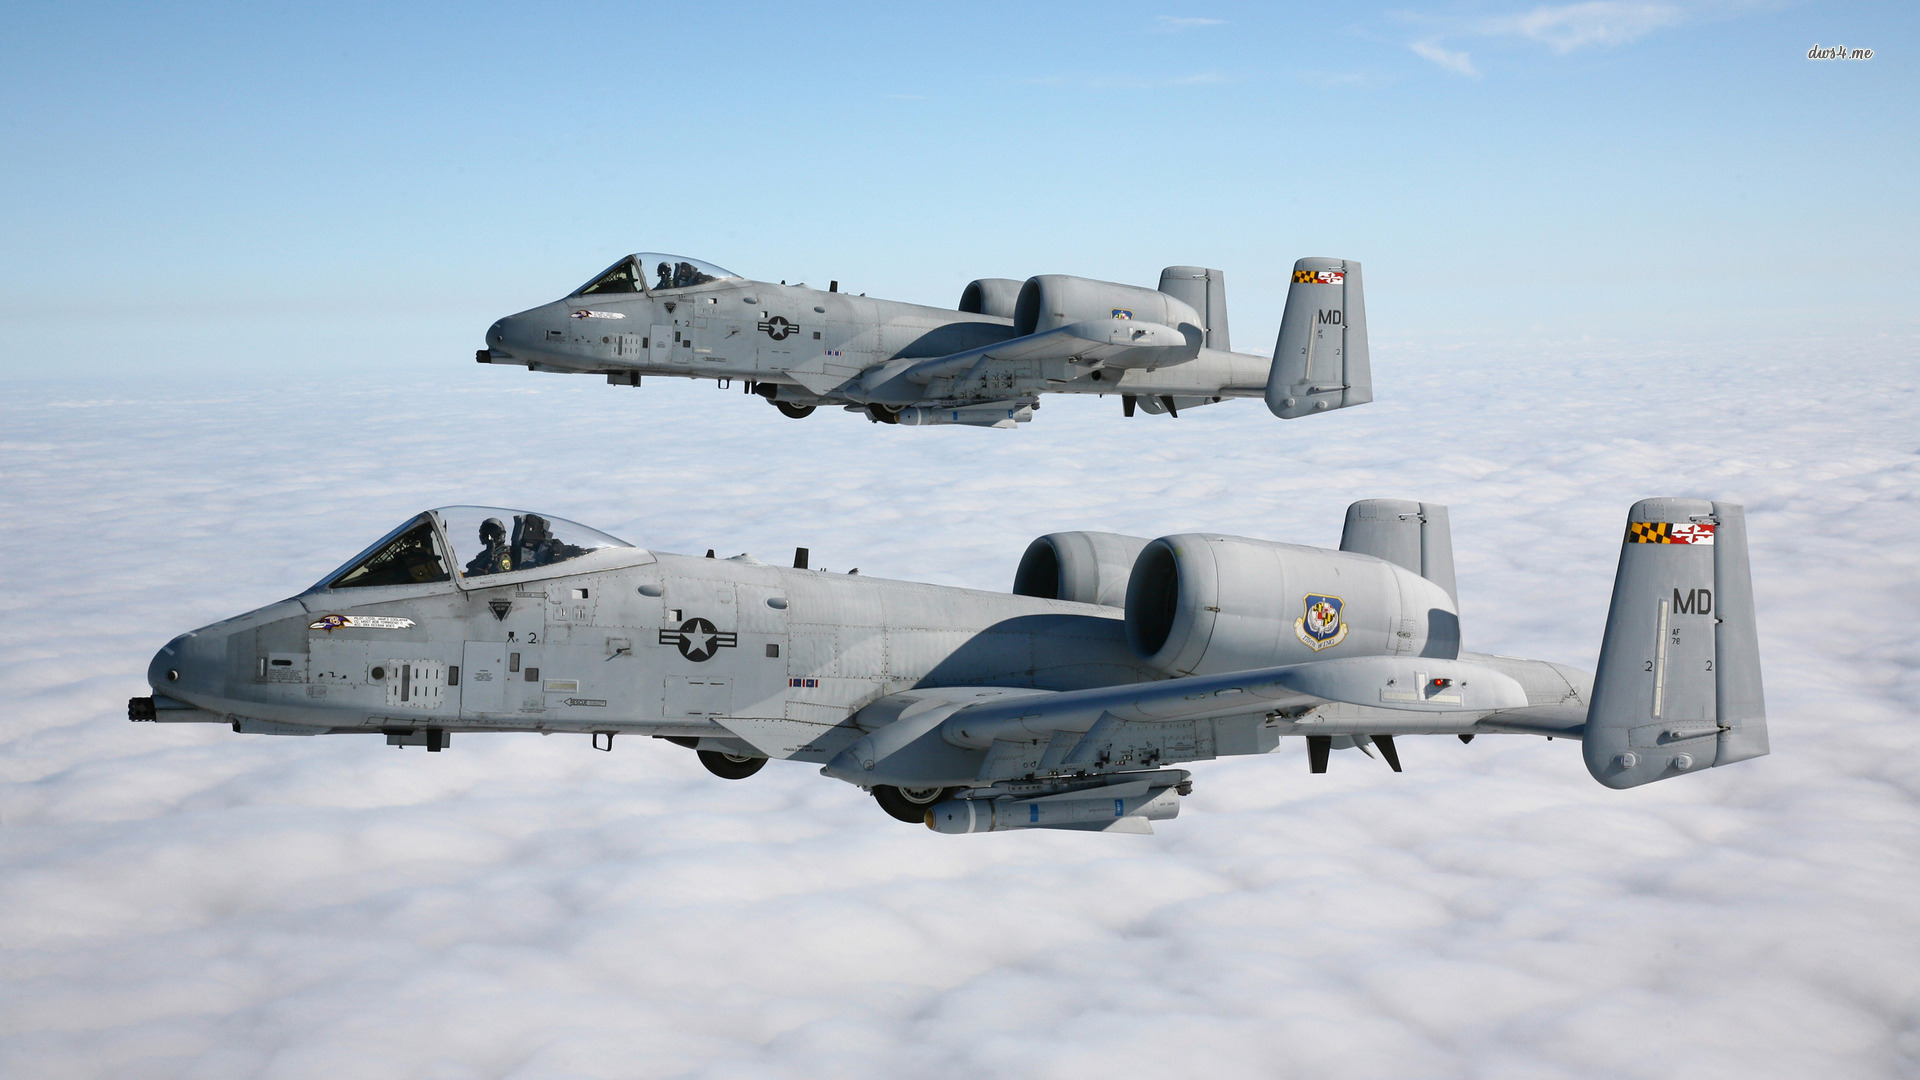 A-10 Thunderbolt II | Military.com